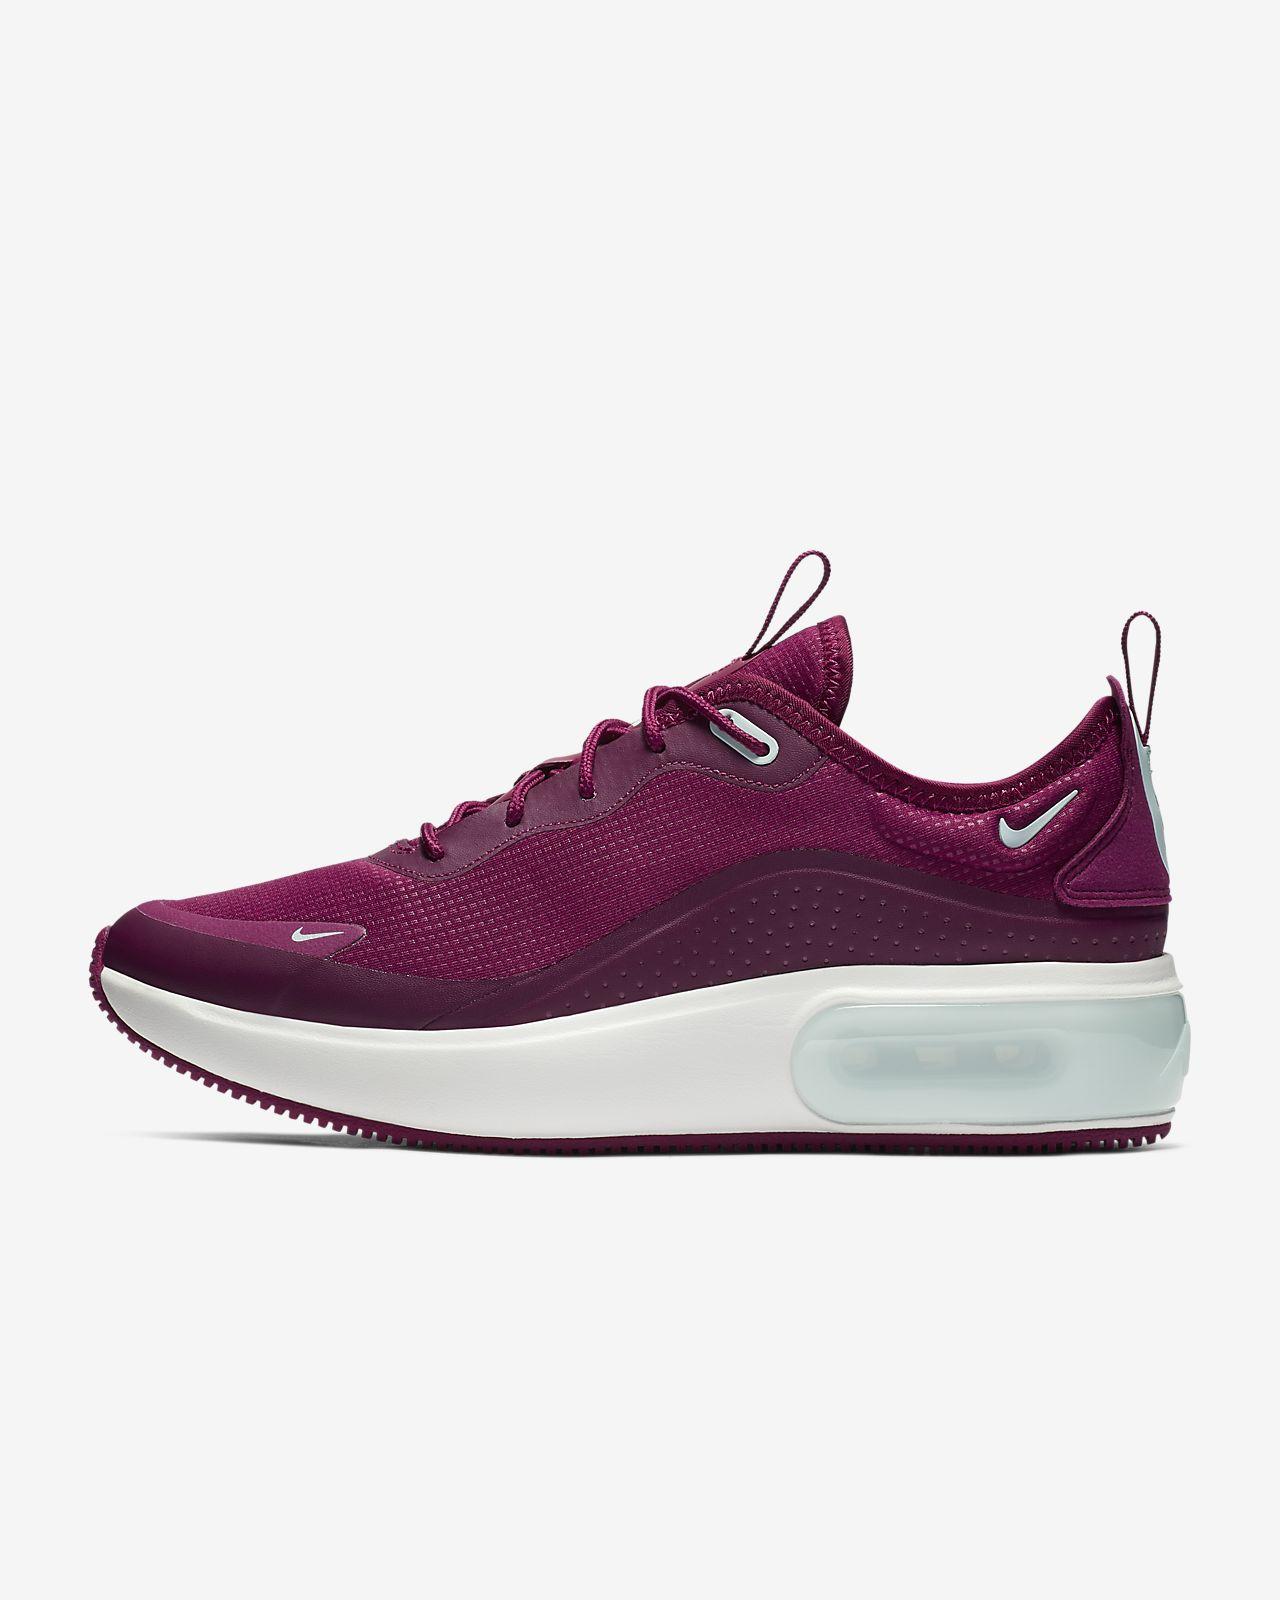 Nike Air Max Bordeaux Herren not in